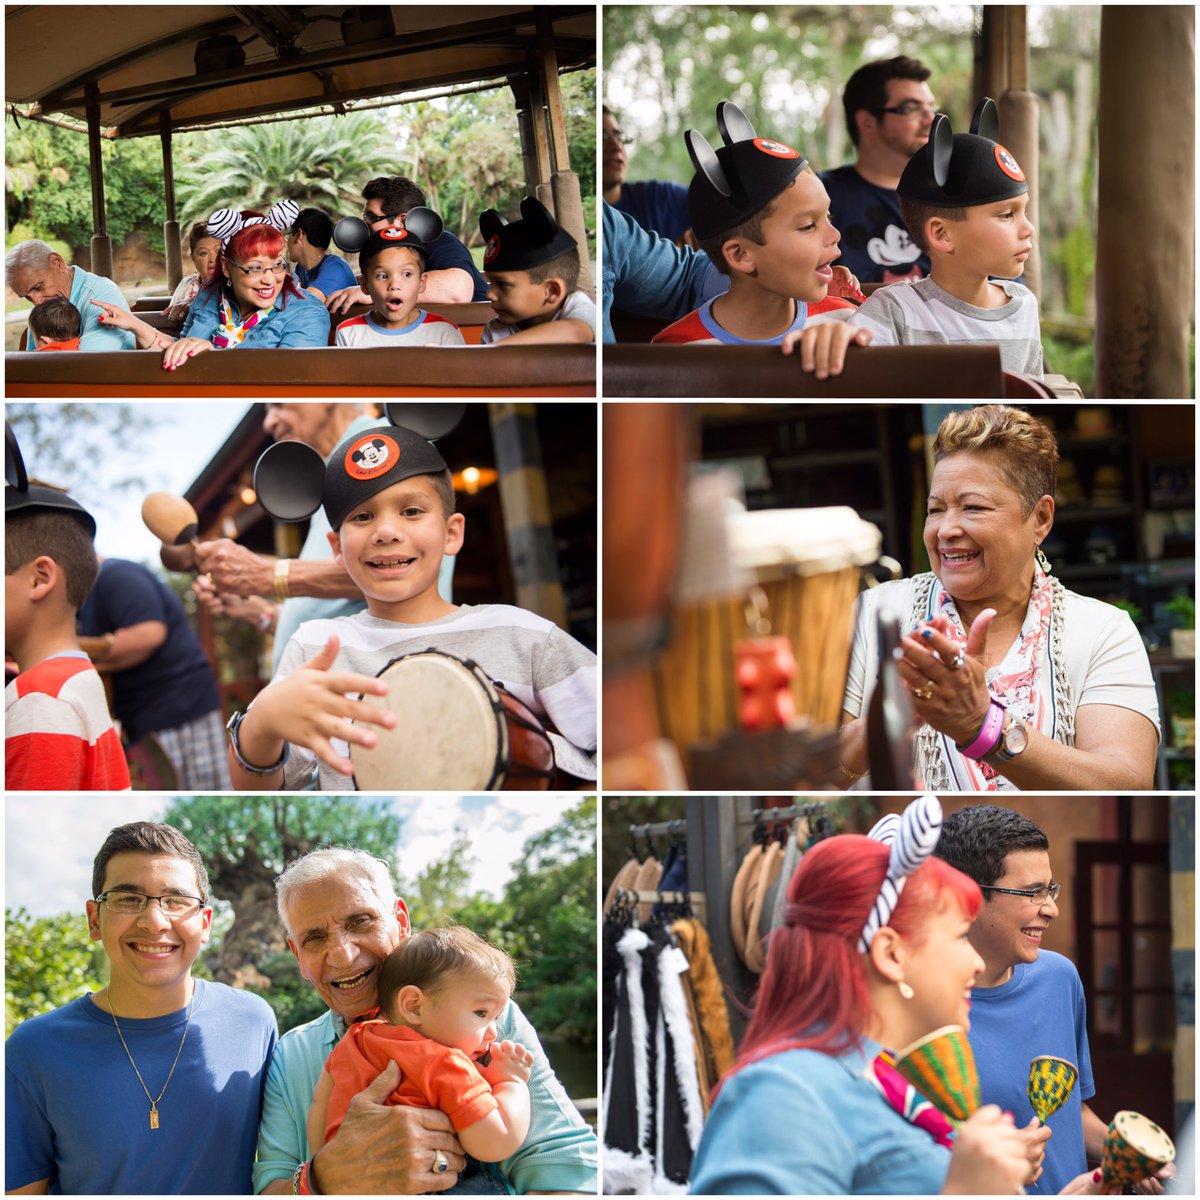 Our family had fun @ Disney's Animal Kingdom! Enter 2 win @WaltDisneyWorld vacation @Latina: https://t.co/u8Xx3HMwz5 https://t.co/JuWFfN1ON9